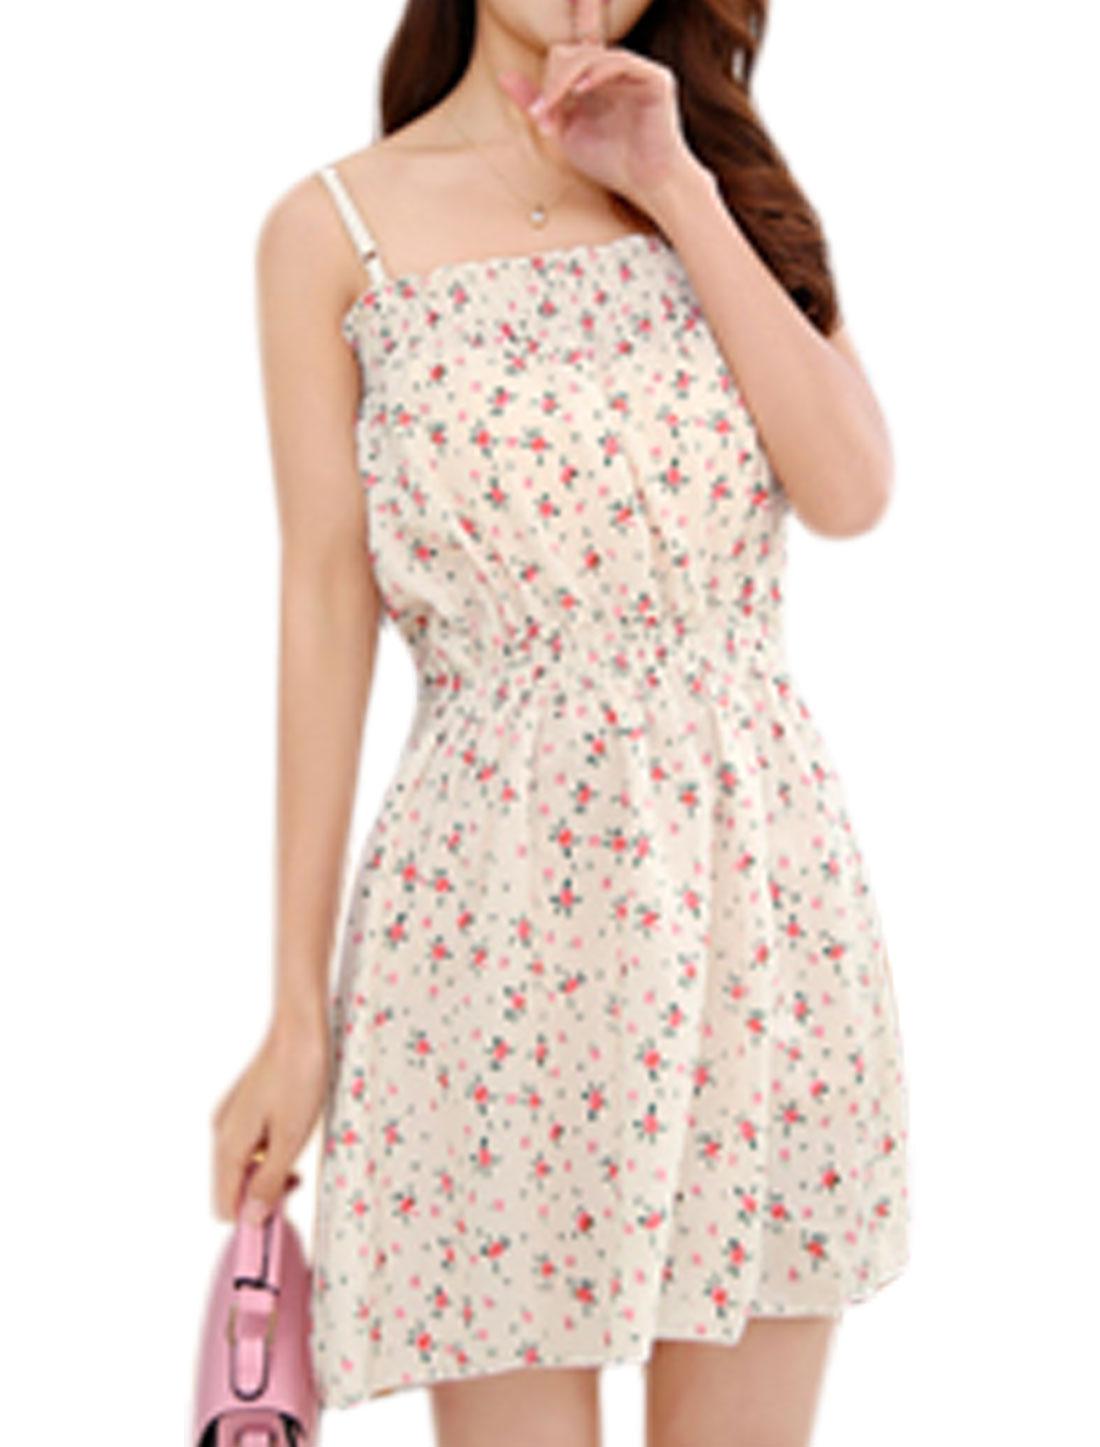 Women Floral Print Elastic Waist Spaghetti Strap Unlined Dress Beige Pink XS